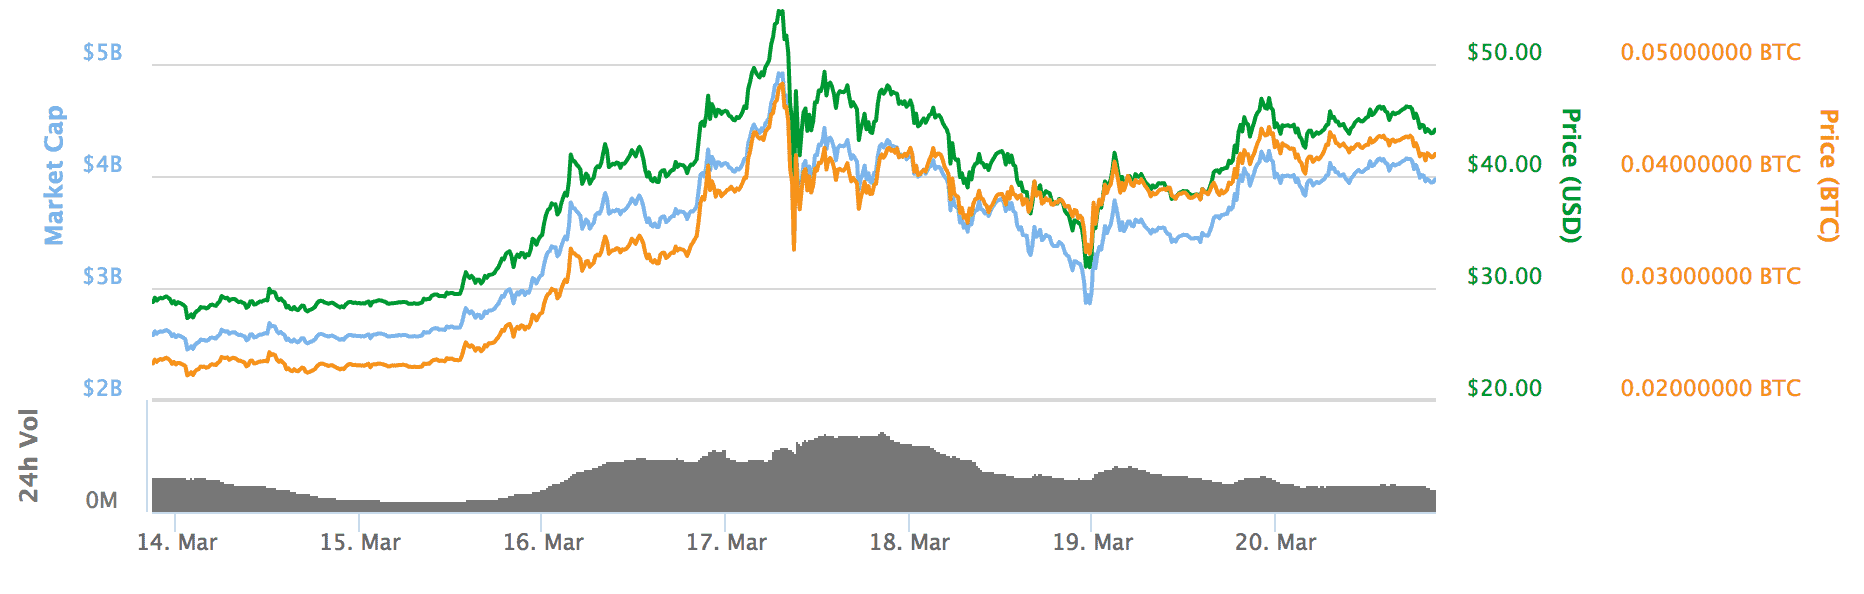 After New Highs, Ethereum Returns to Rangebound Trading